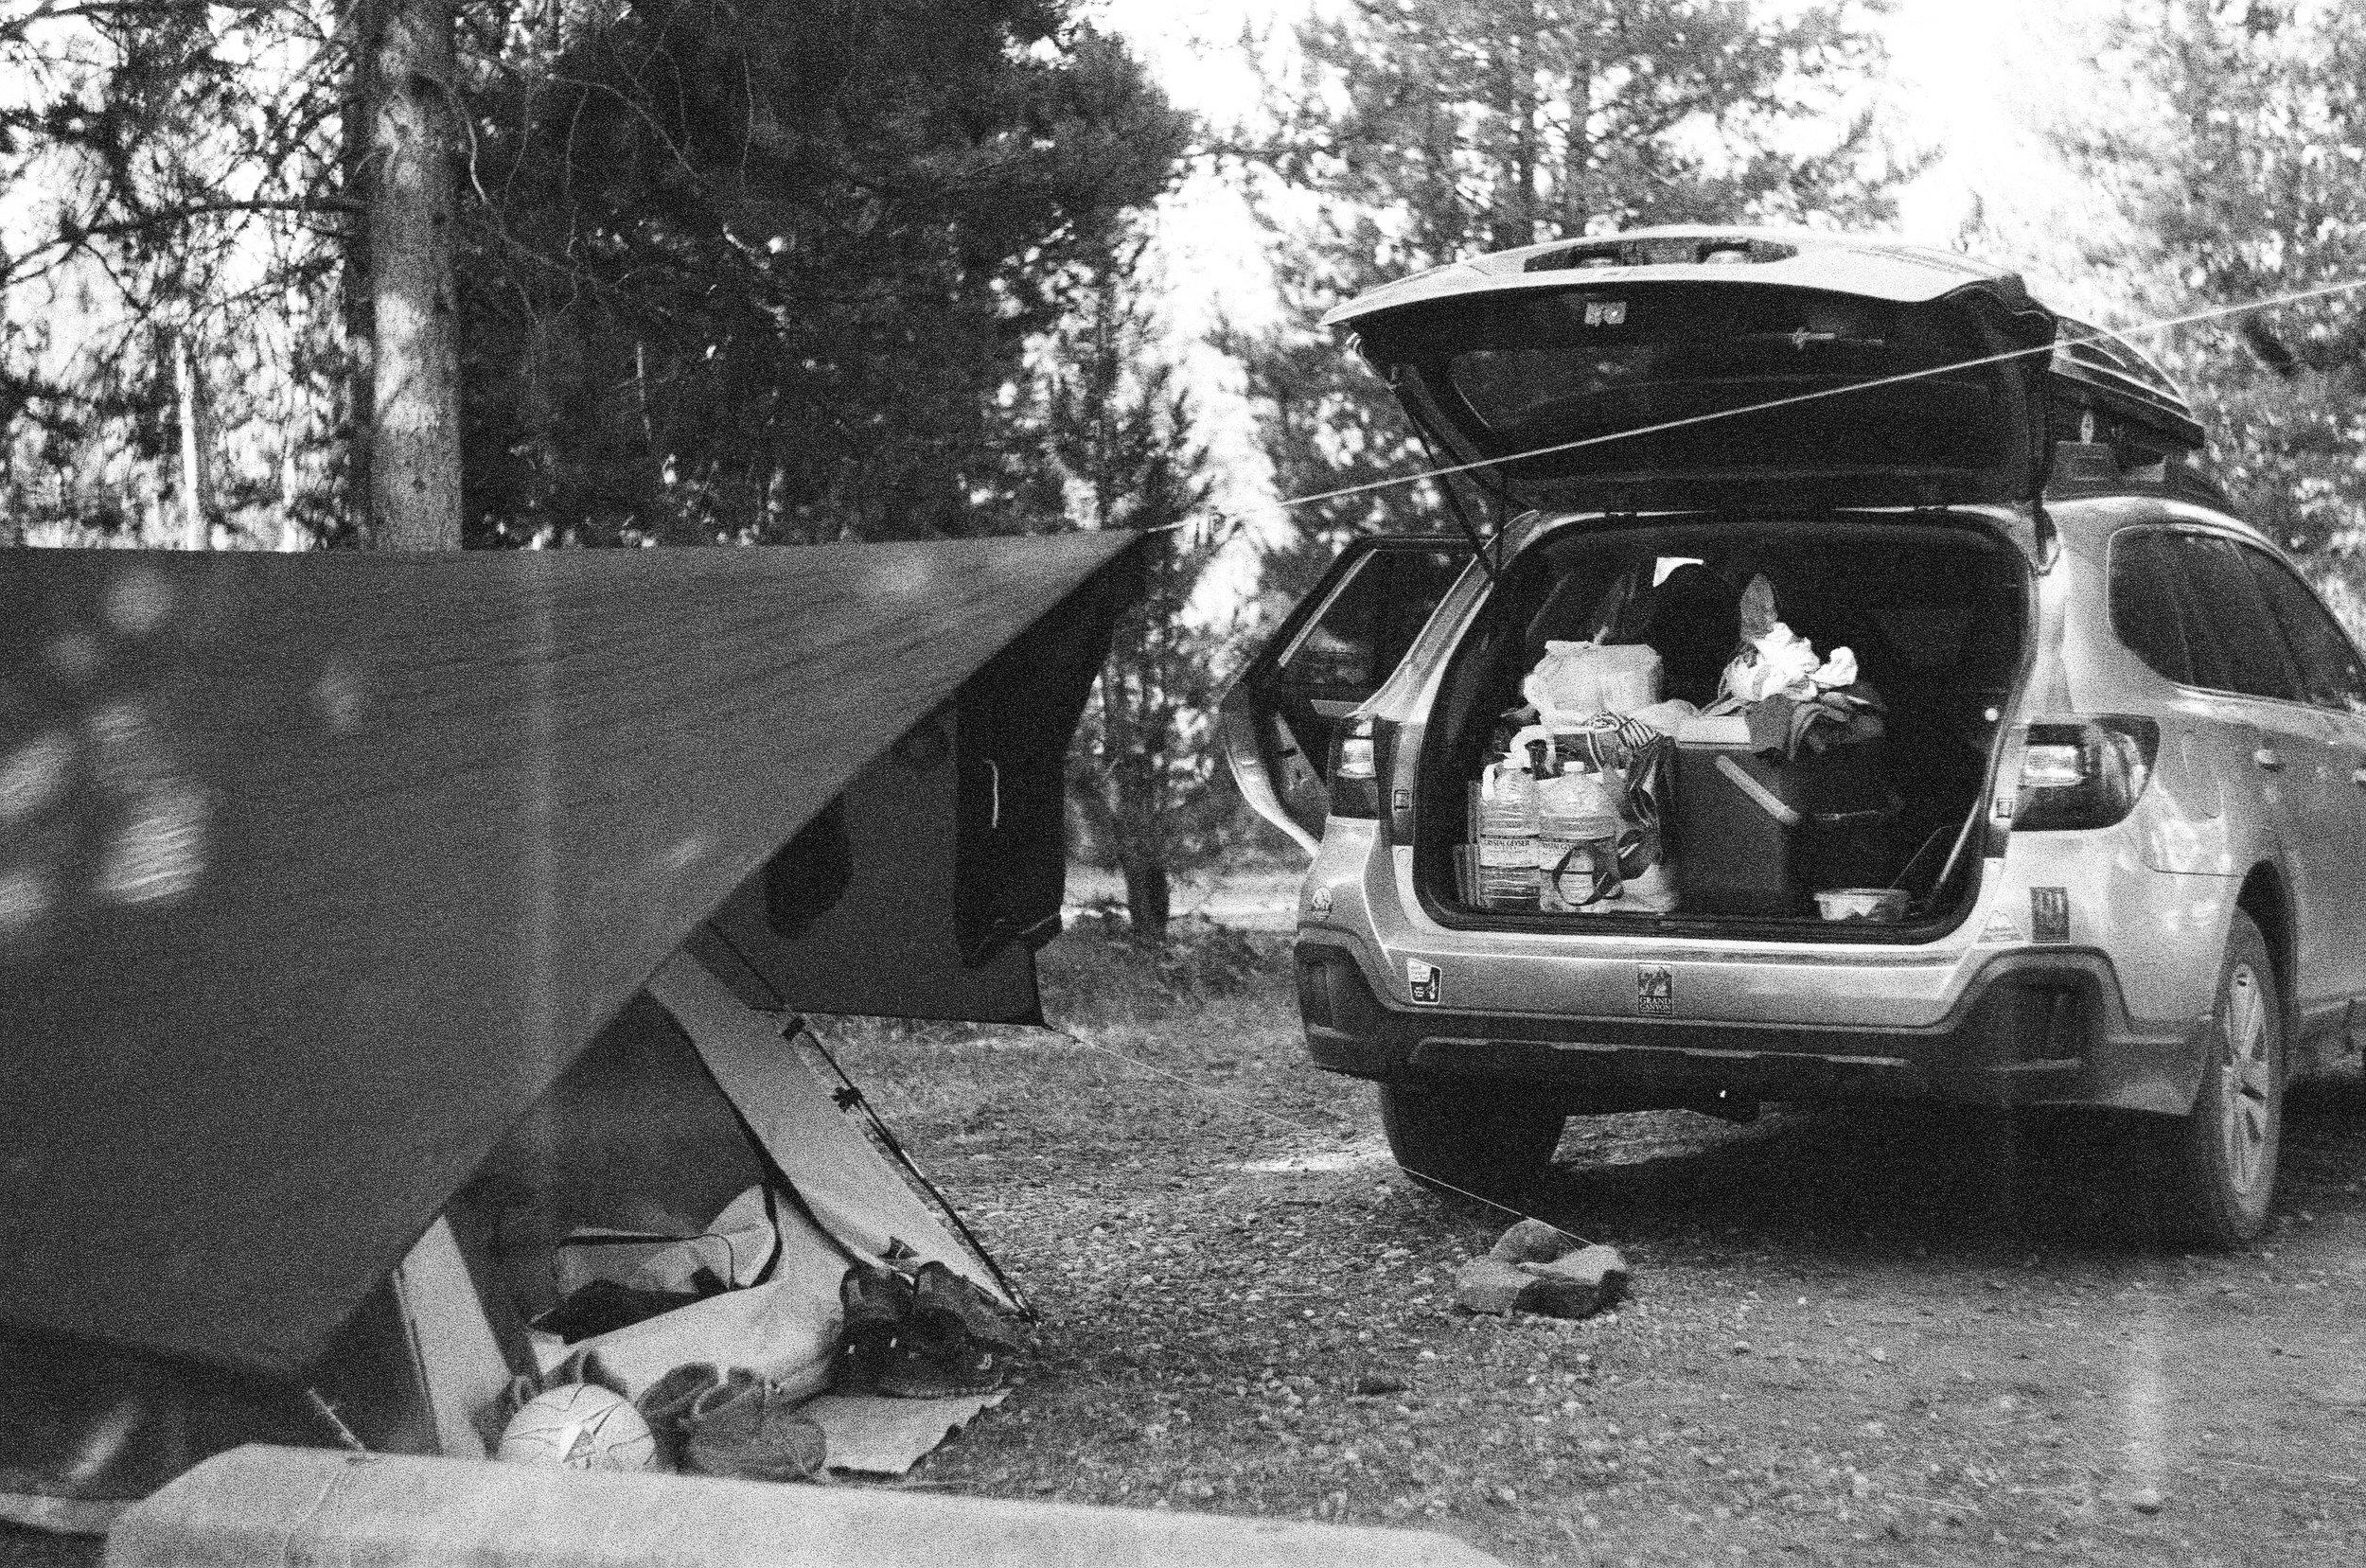 Teton Camp Site